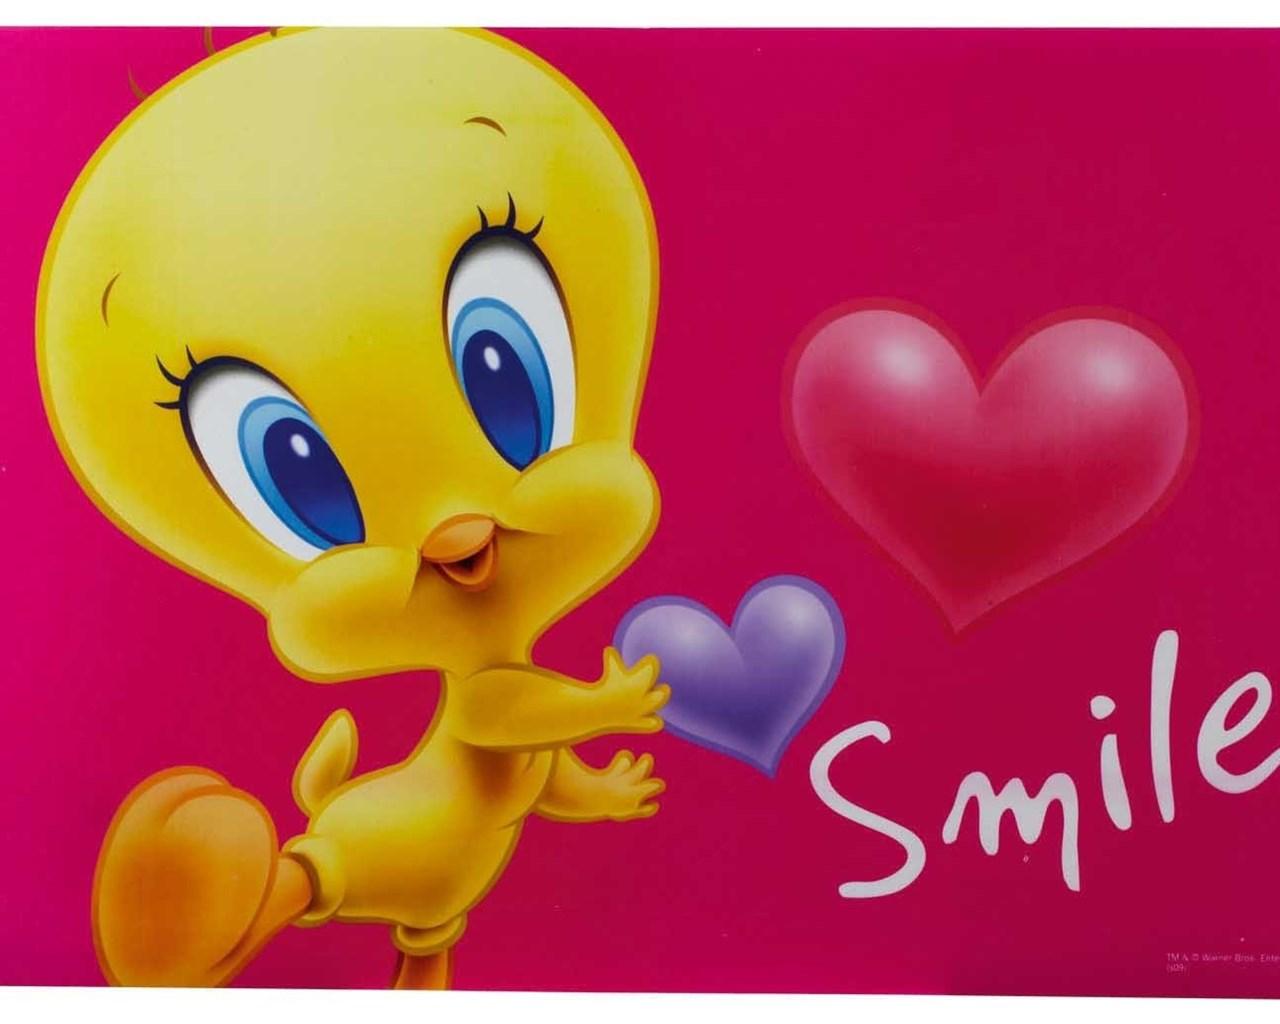 Baby Tweety Bird Pictures HD Wallpapers And Desktop Background